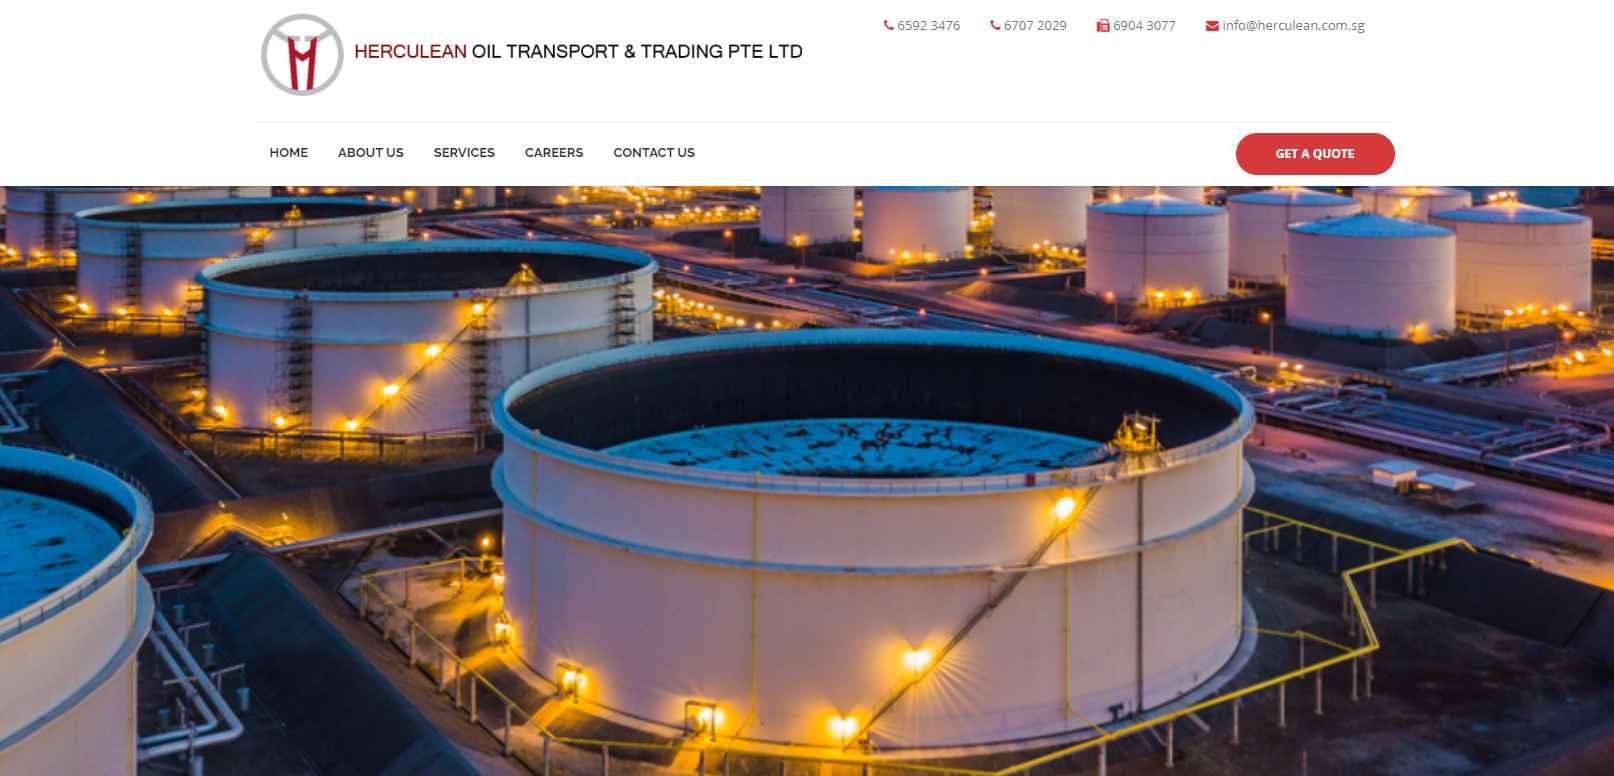 herculean Top Fuel Suppliers in Singapore